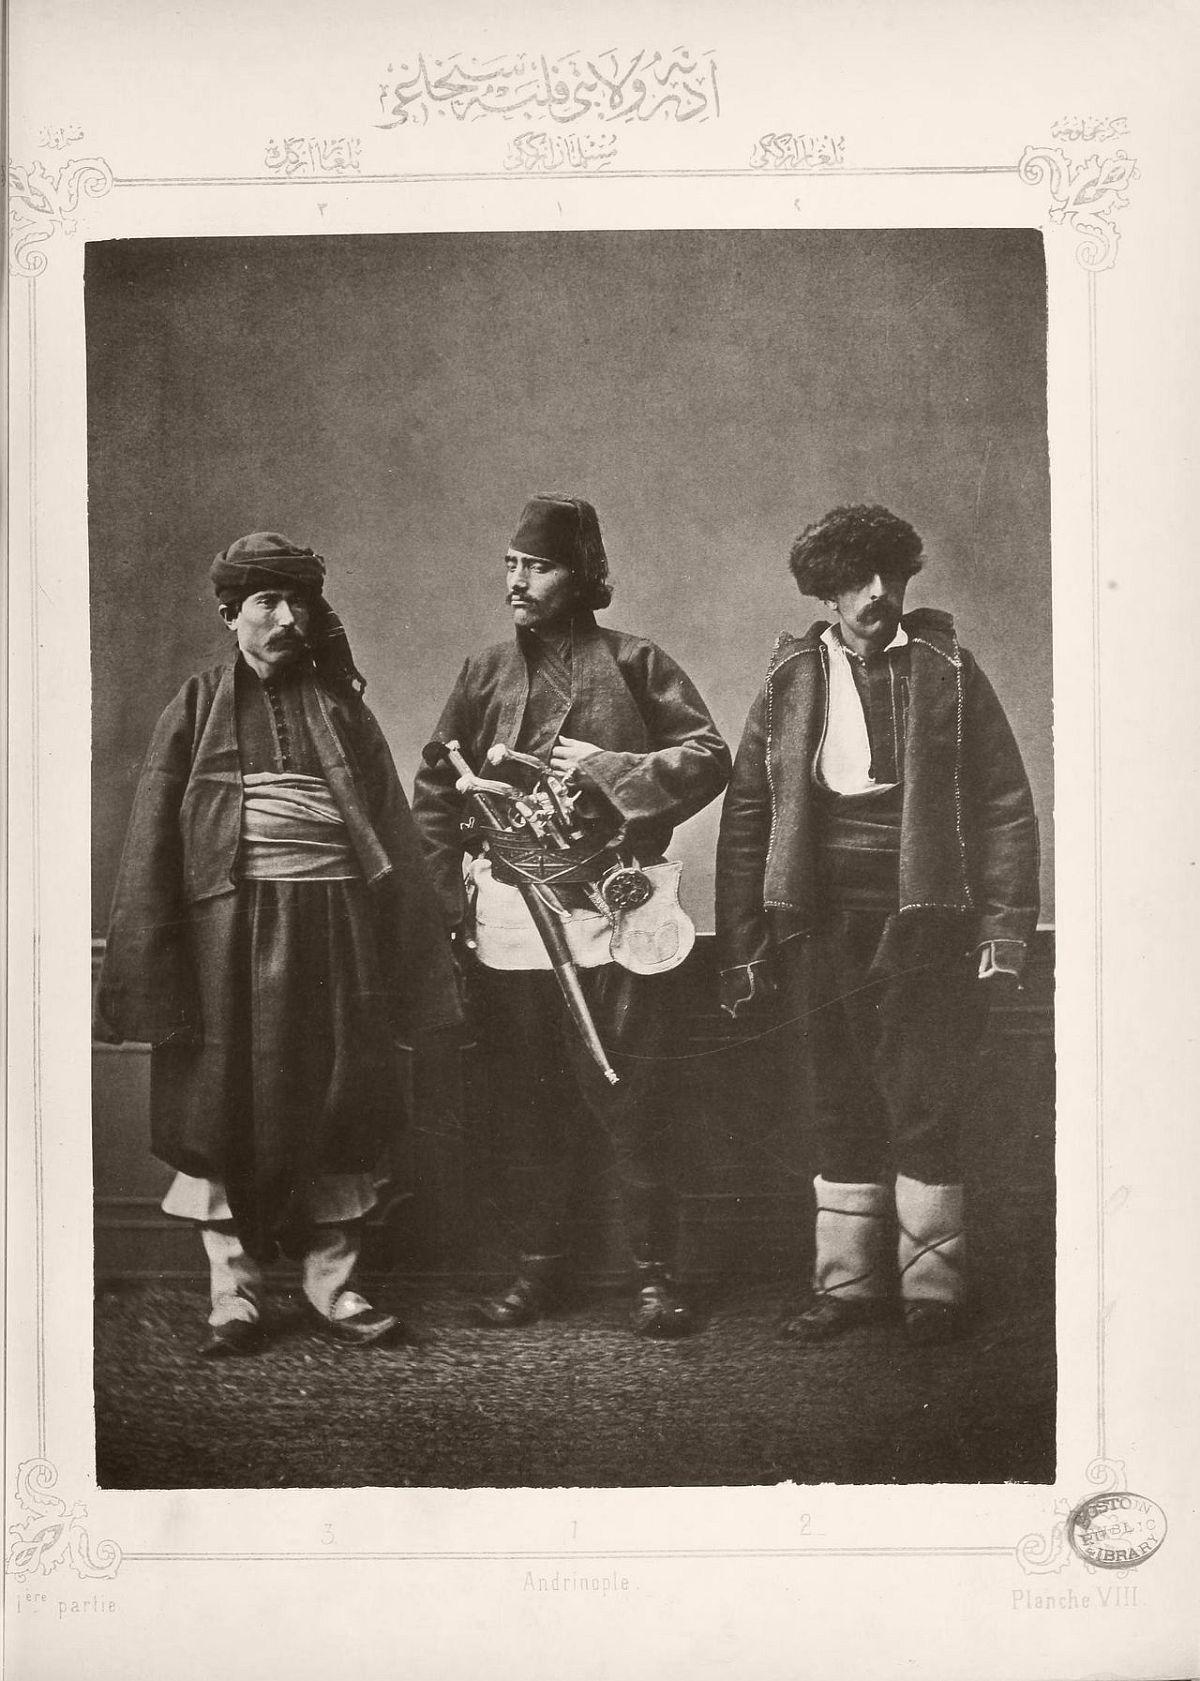 1. Muslim horseman from Plovdiv 2. Bulgarian woman from Koyountepe 3. Bulgarian woman from Ah'i Tchelebi